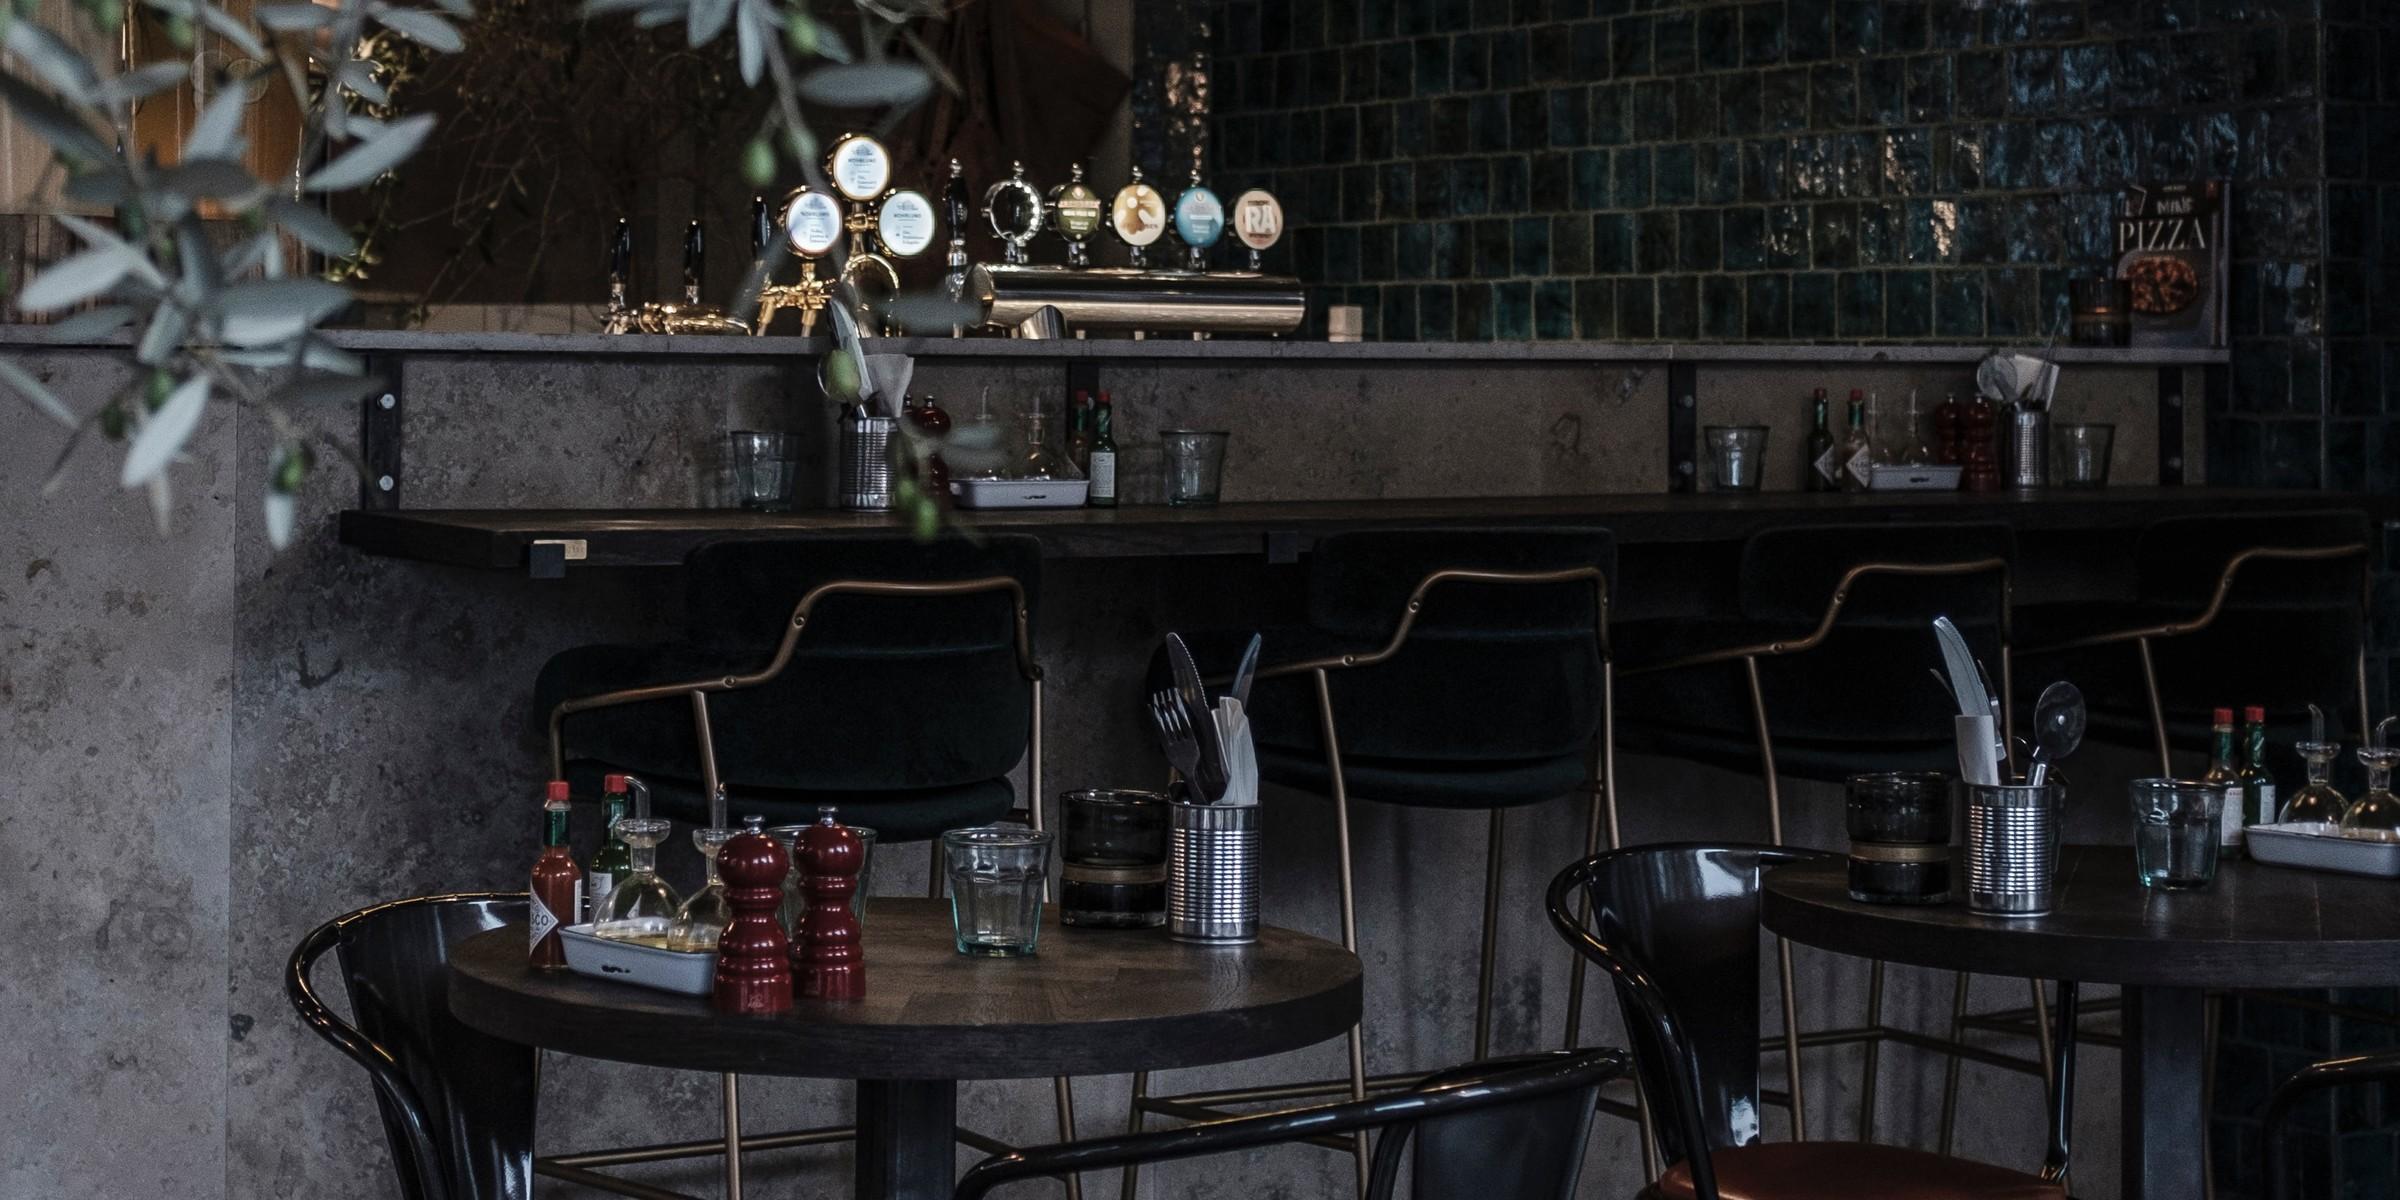 Крафт-бар: дело не в пиве